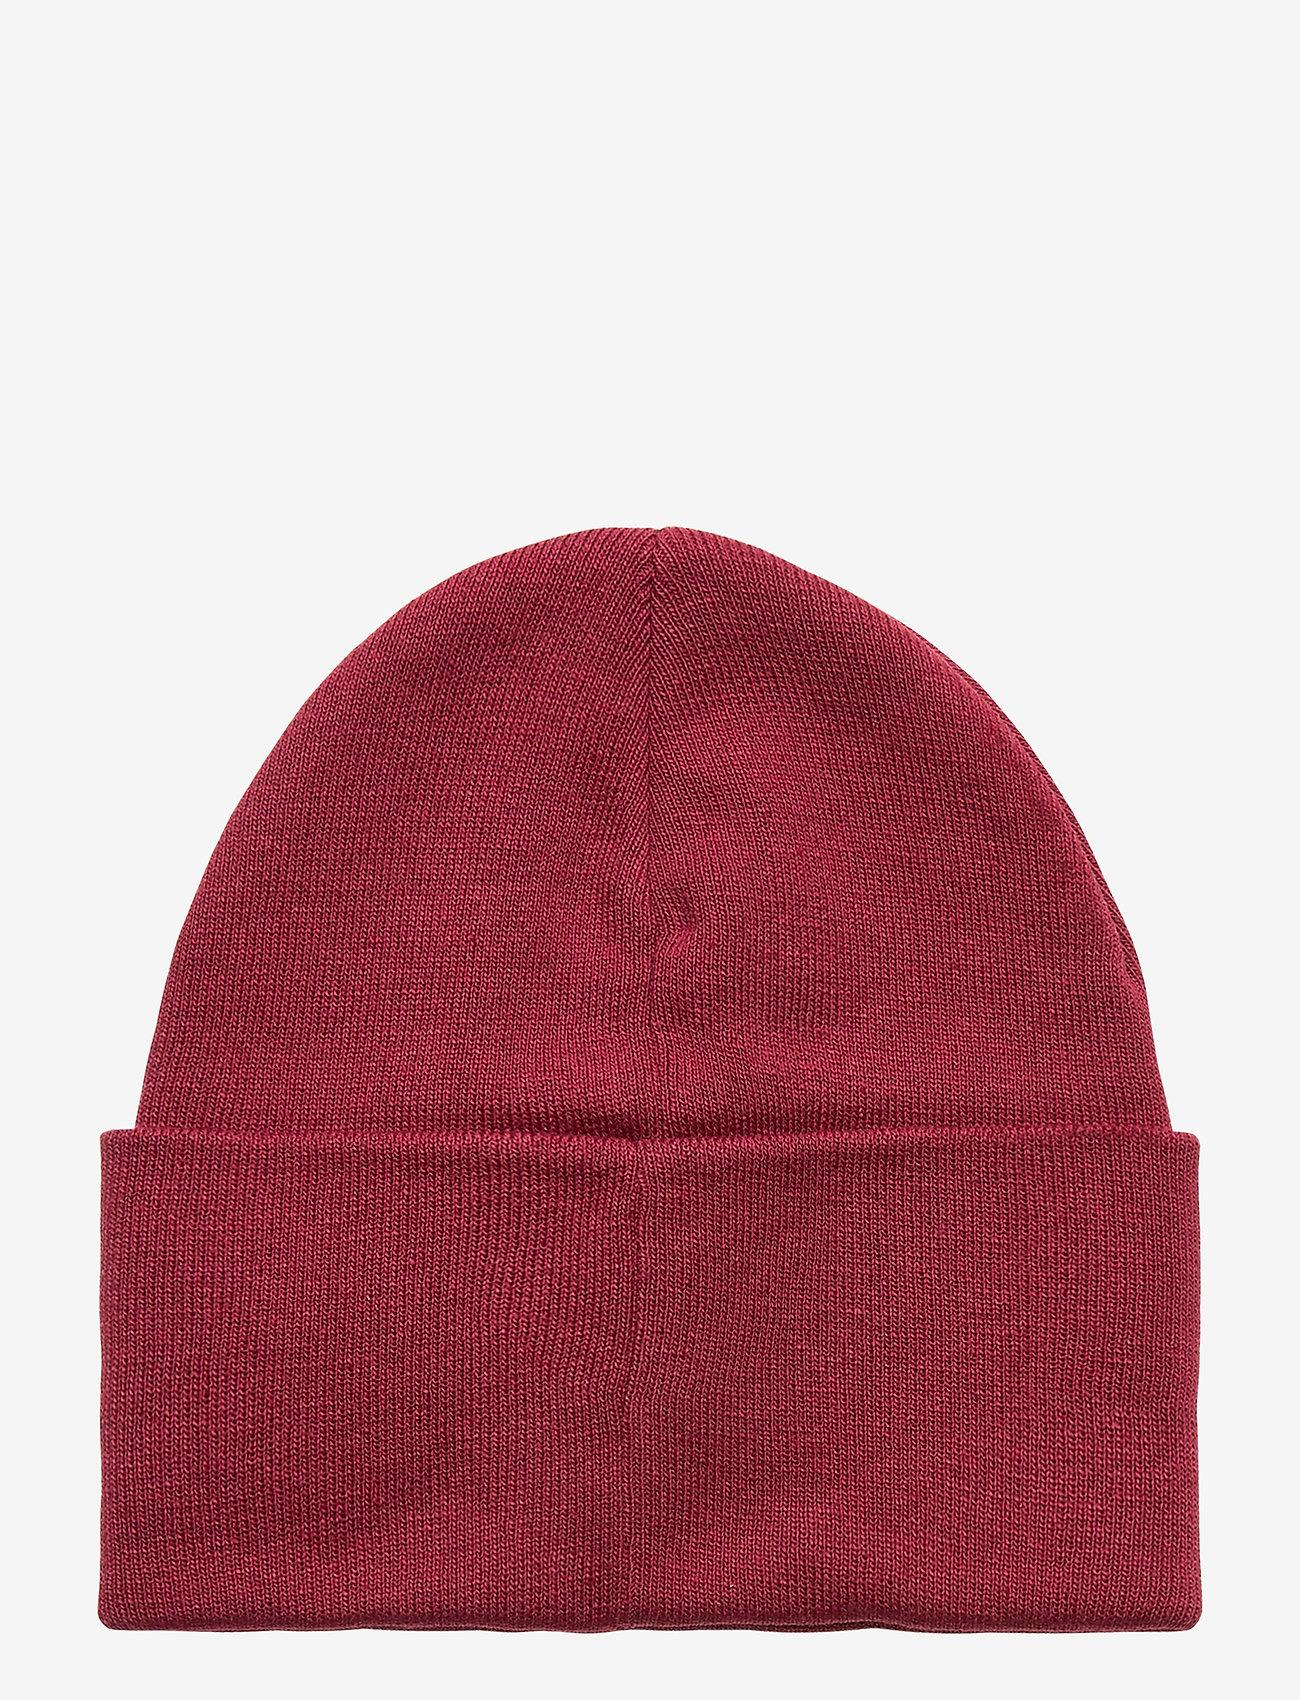 Replay - Cap - chapeaux - red purple - 1